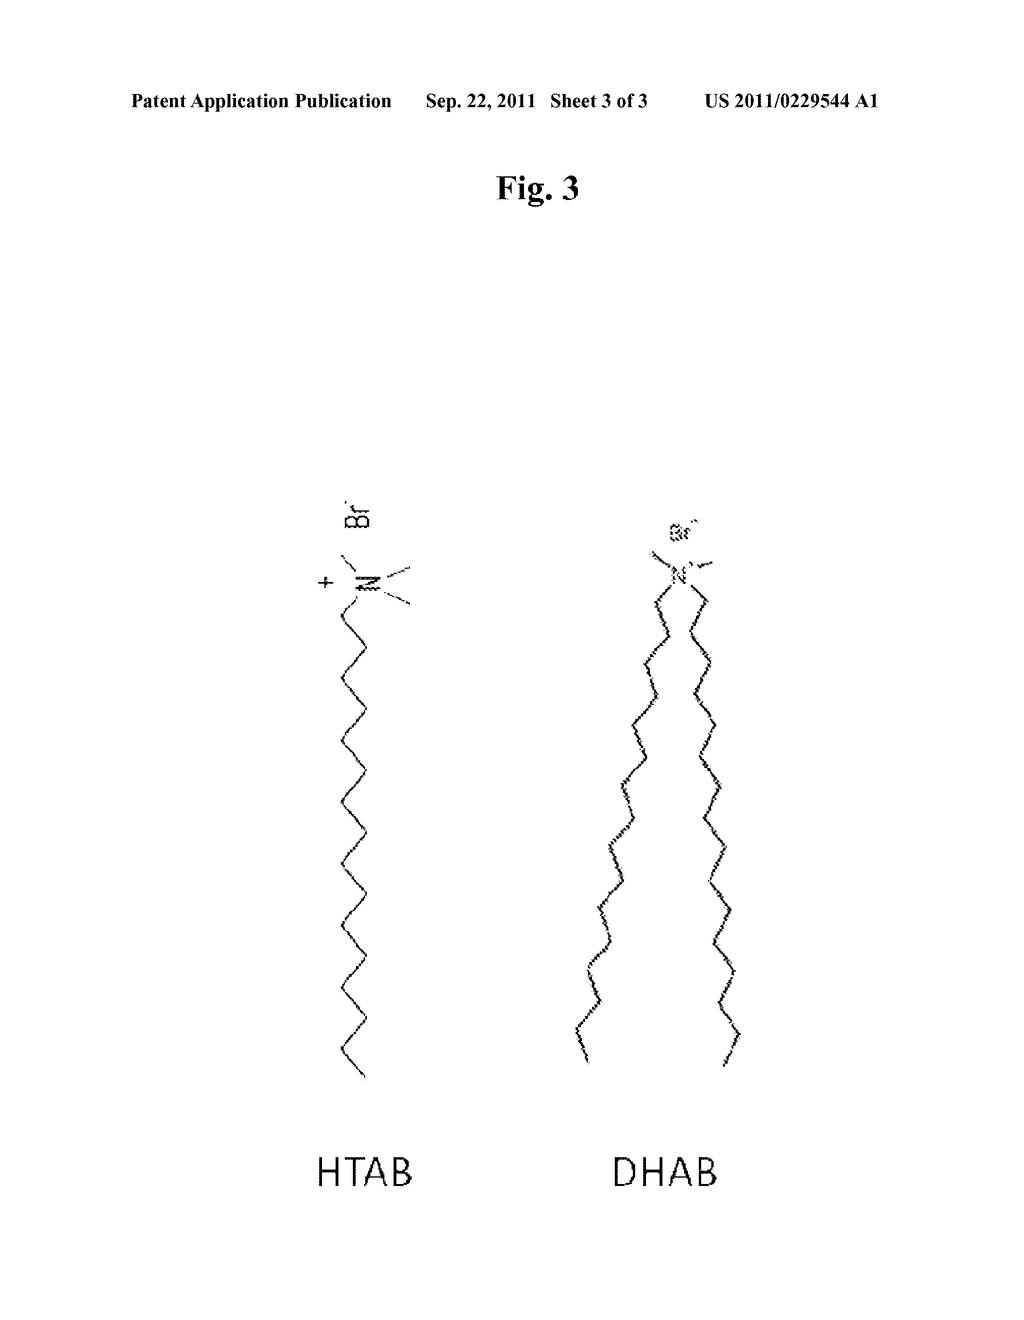 Lenel Lnl 2220 Wiring Diagram Periodic Tables – Lenel 1320 Wiring Board Diagram